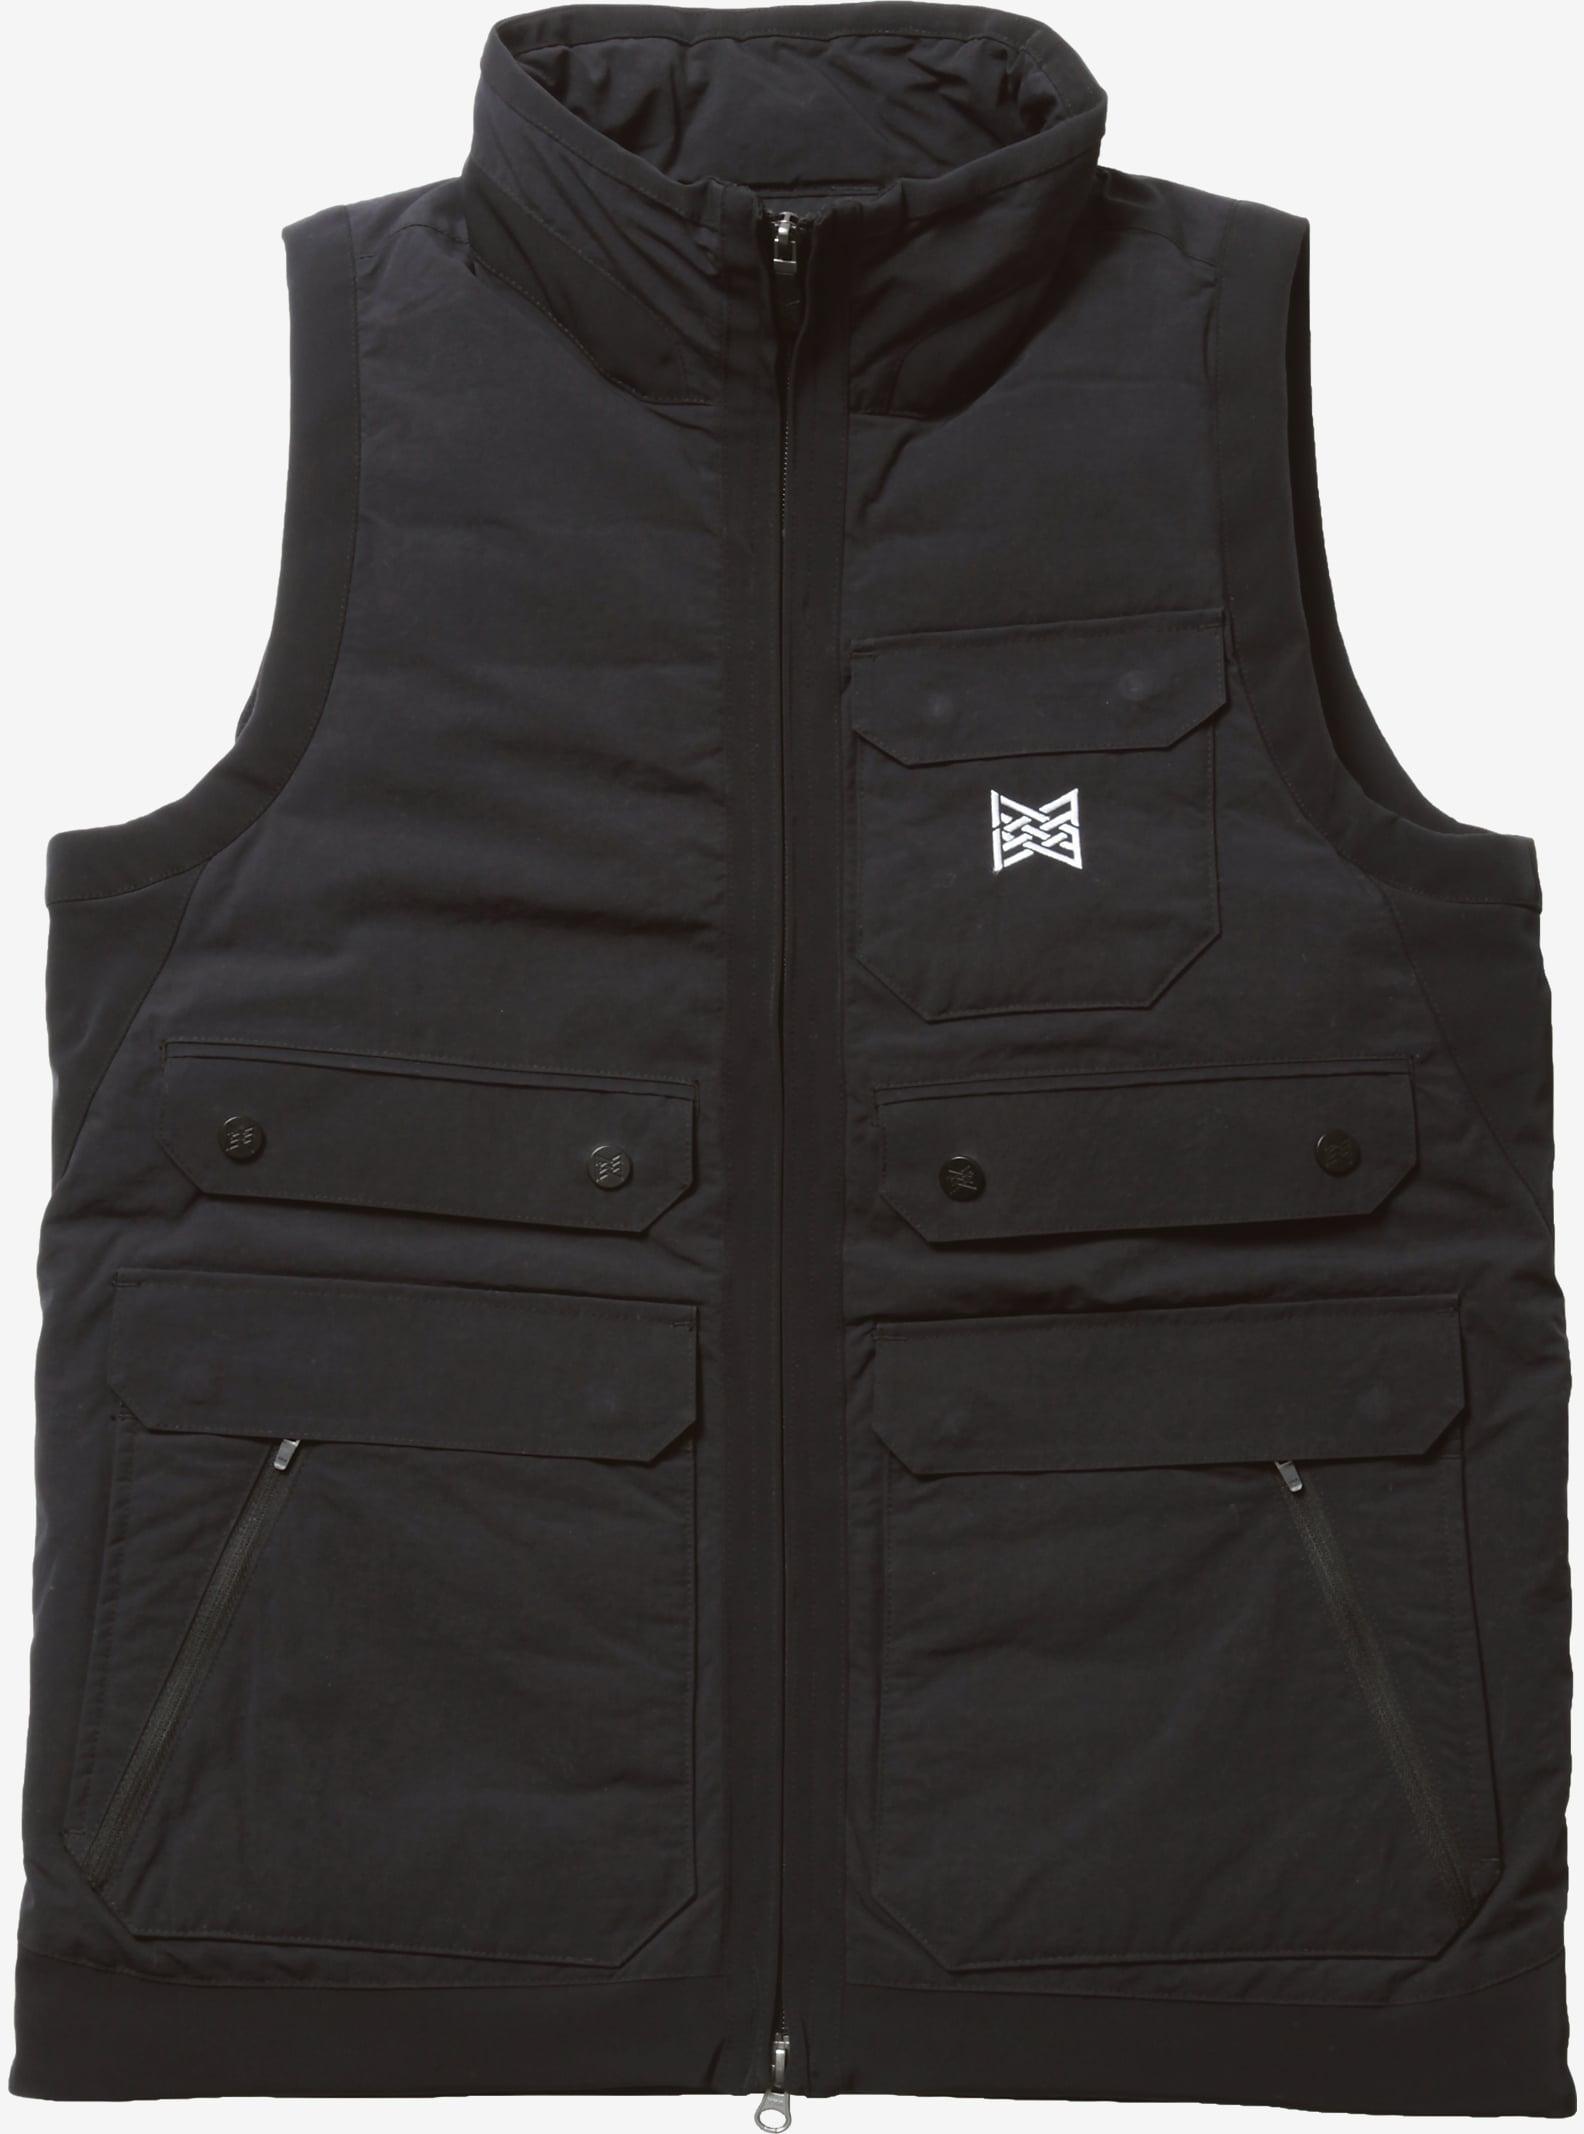 Burton THIRTEEN Raveled Vest shown in Black